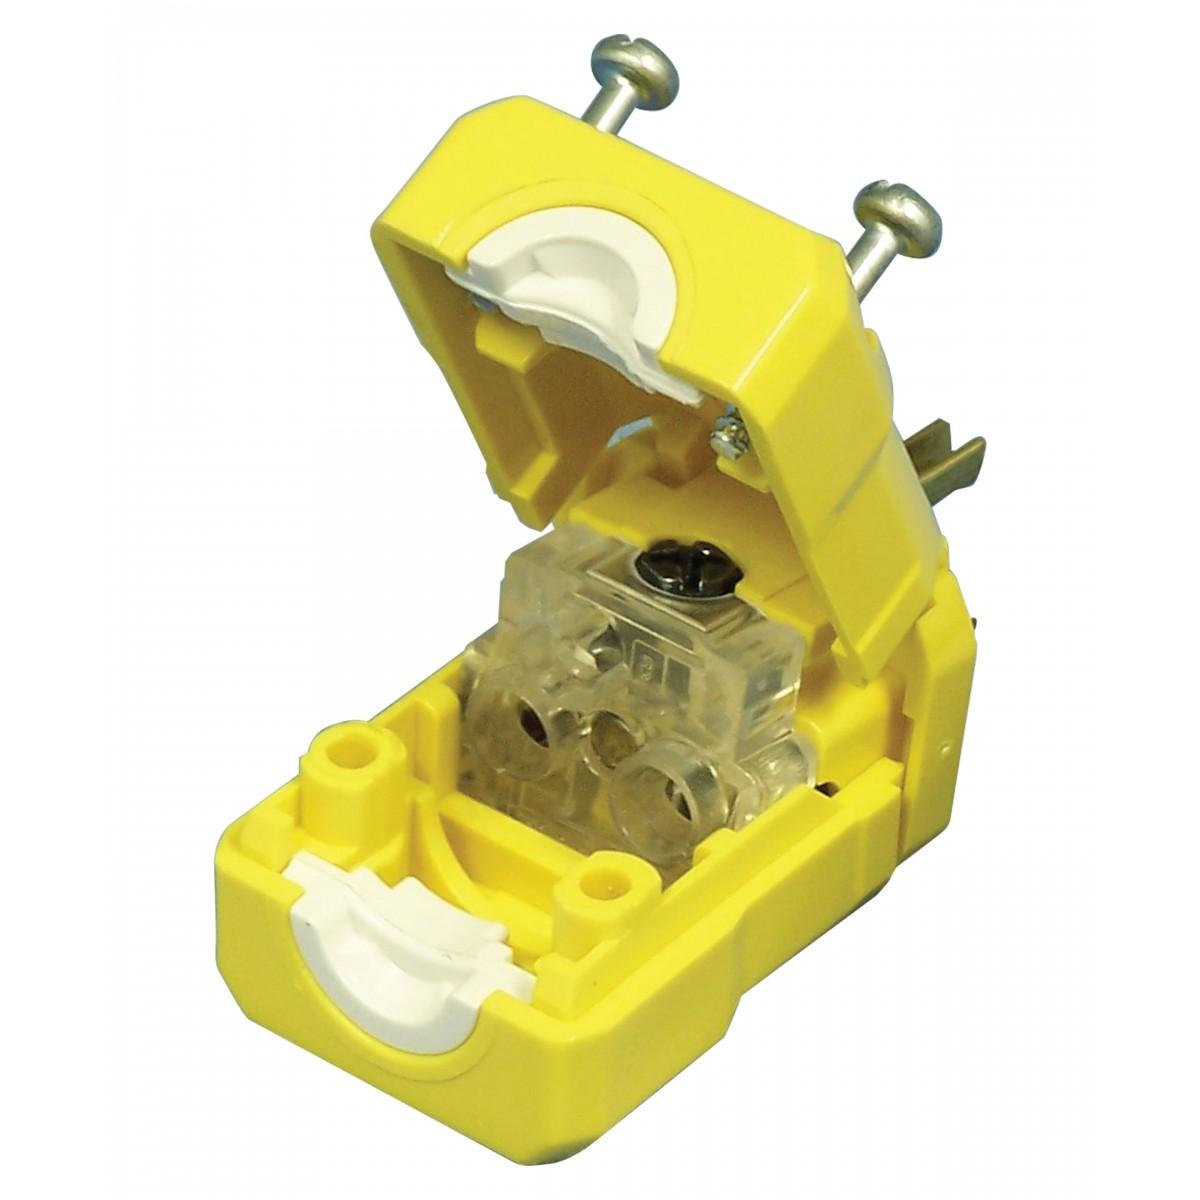 electric male plug 3 wires top quality yellow leviton rh johnnyvac com Polarized Plug Wiring Leviton wiring a leviton plug pdf